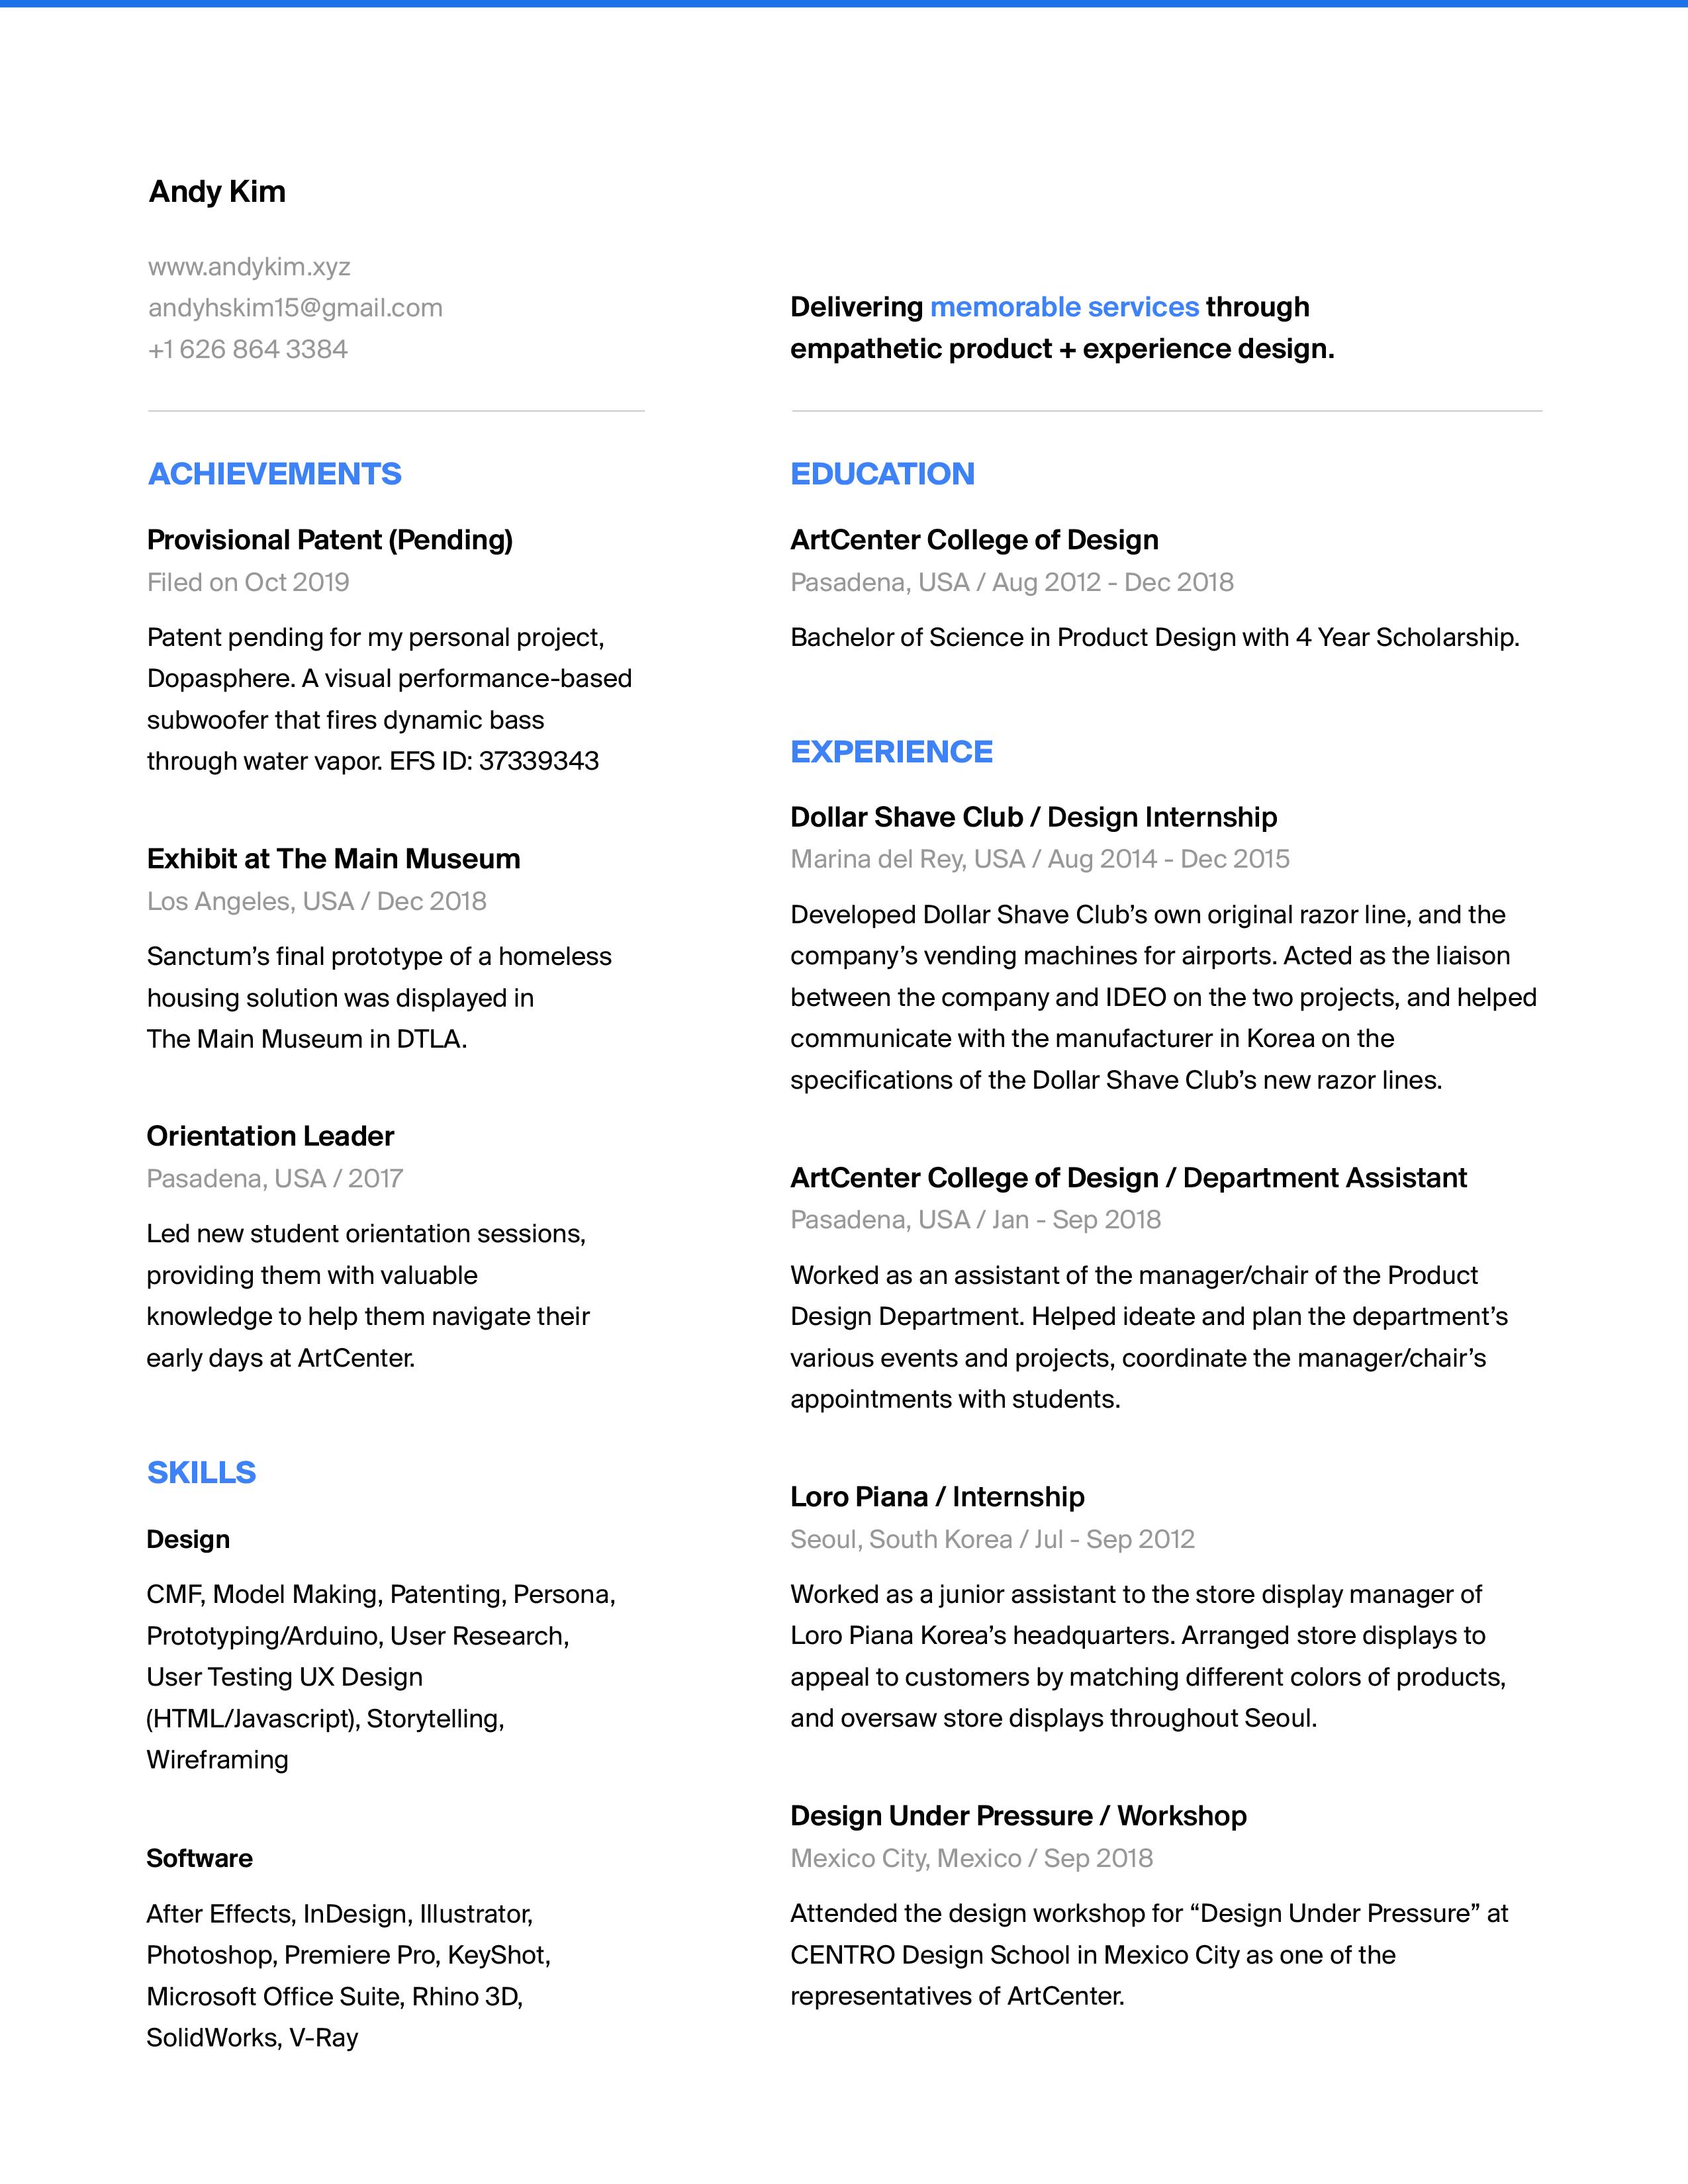 AndyKim_Resume2019Oct